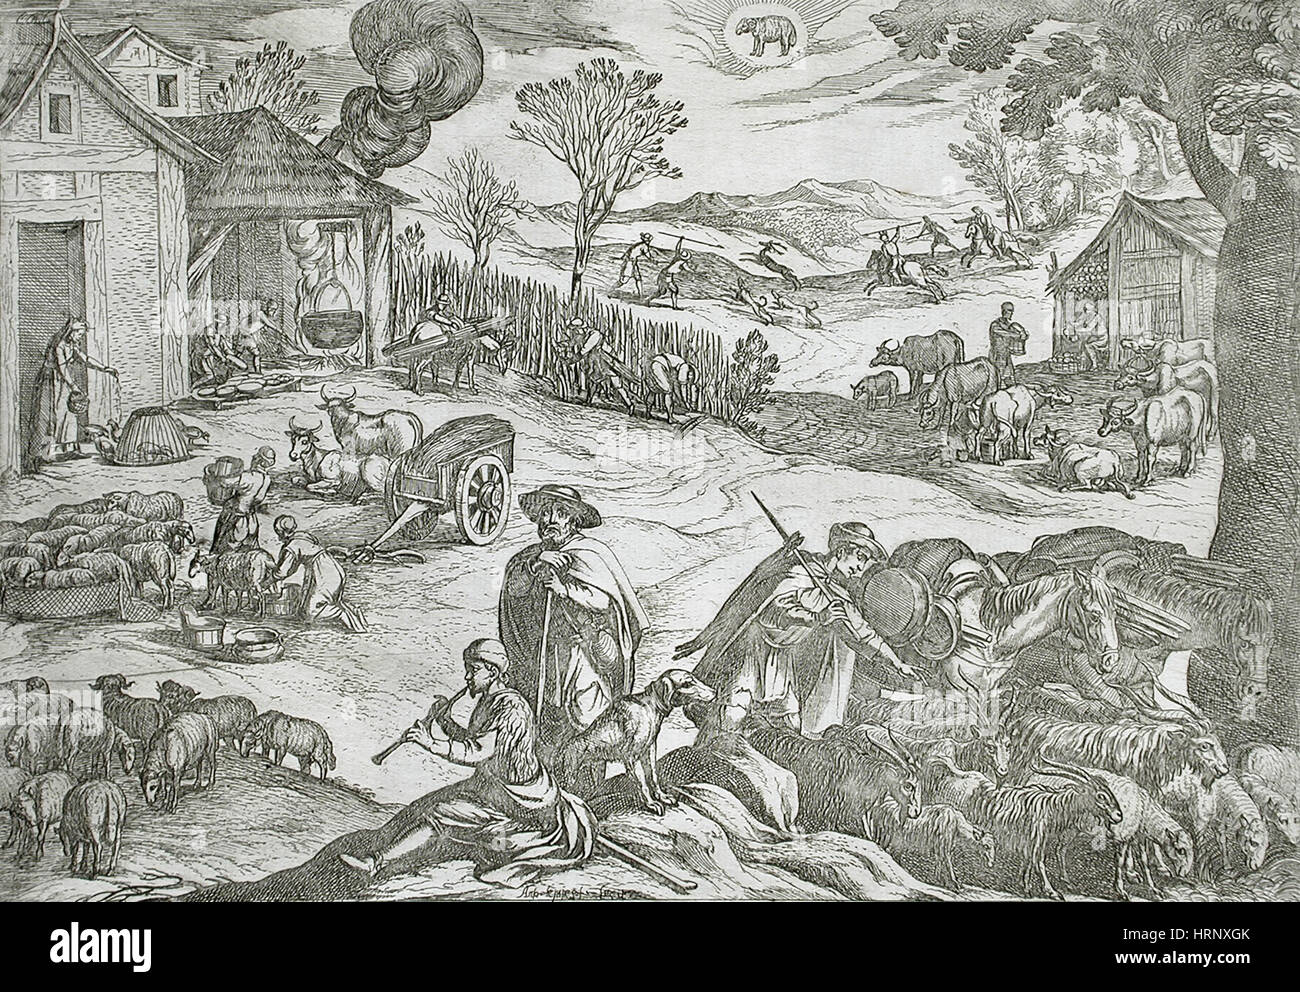 March, Peasant Activities, 16th Century Calendar - Stock Image